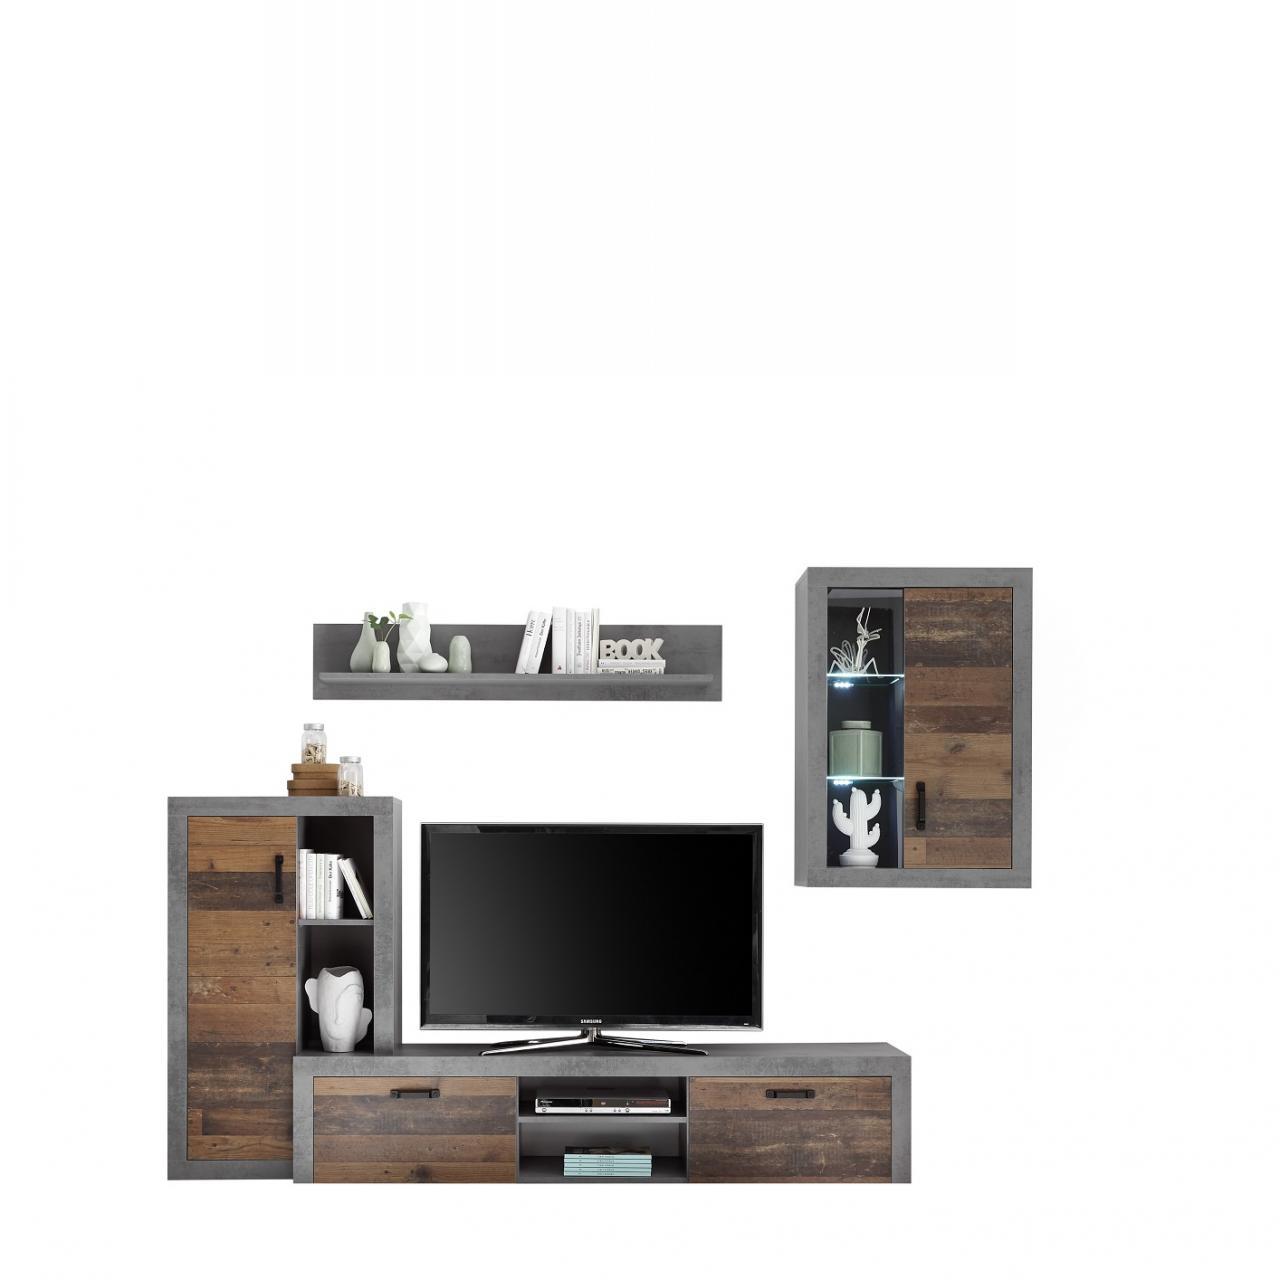 Anbauwand Team Matera Old Wood Wohnzimmer Schrankwand MDF 4-teilig Wohnwand